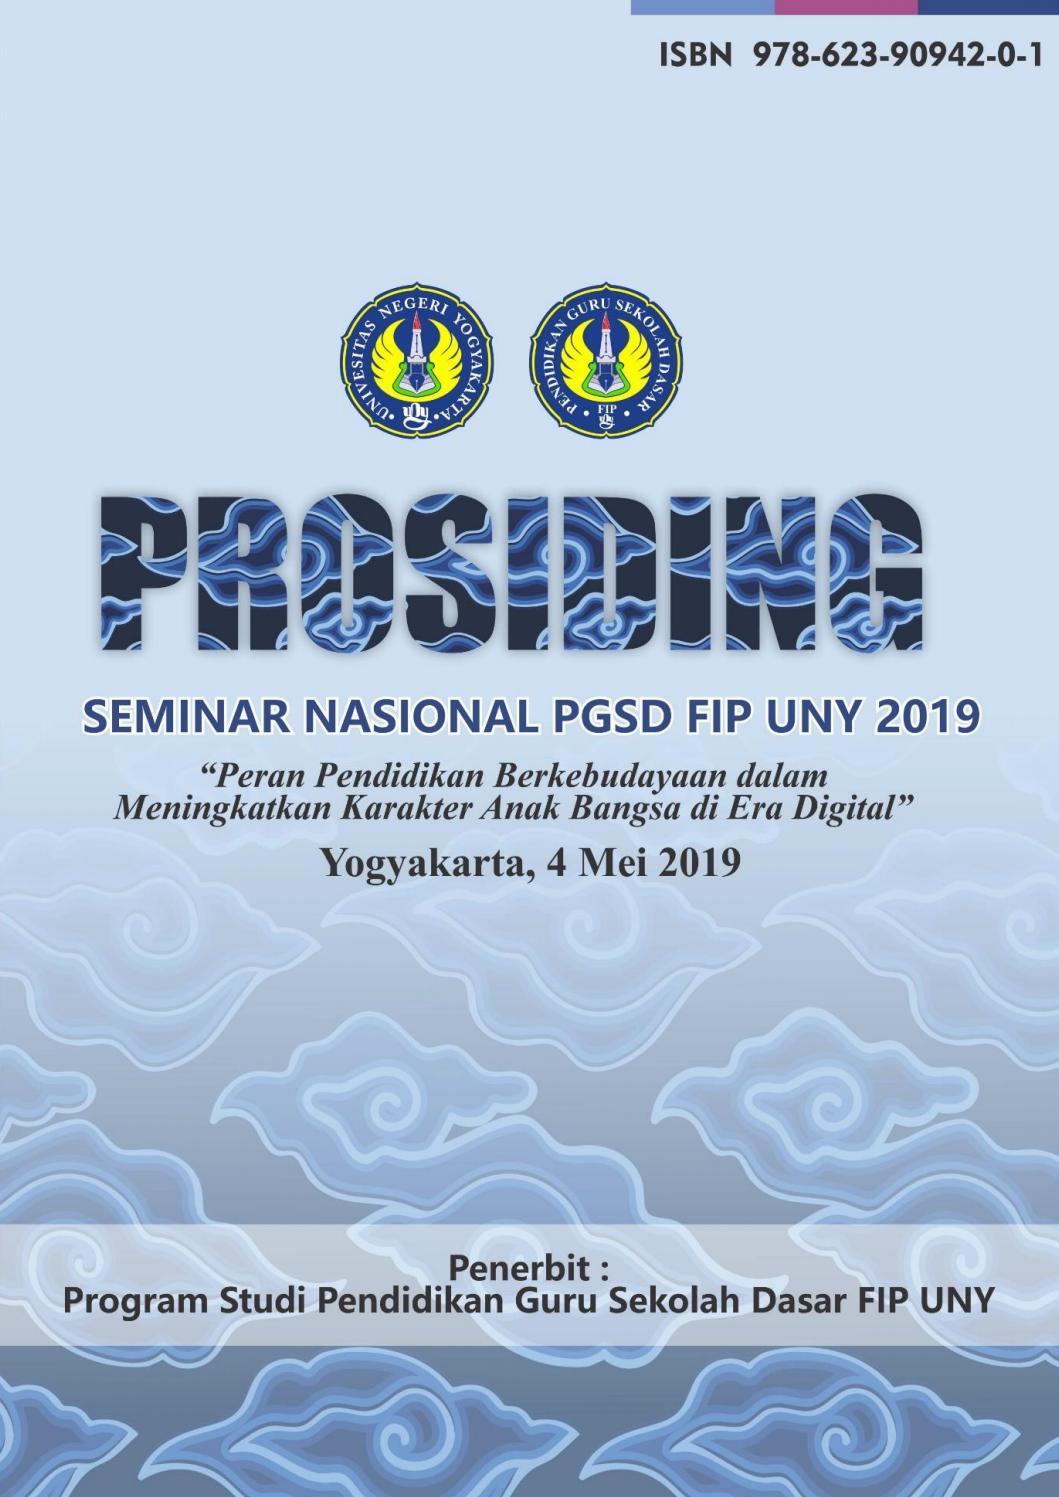 Prosiding Seminar Nasional Pgsd Fip Uny 2019 By Pls Fip